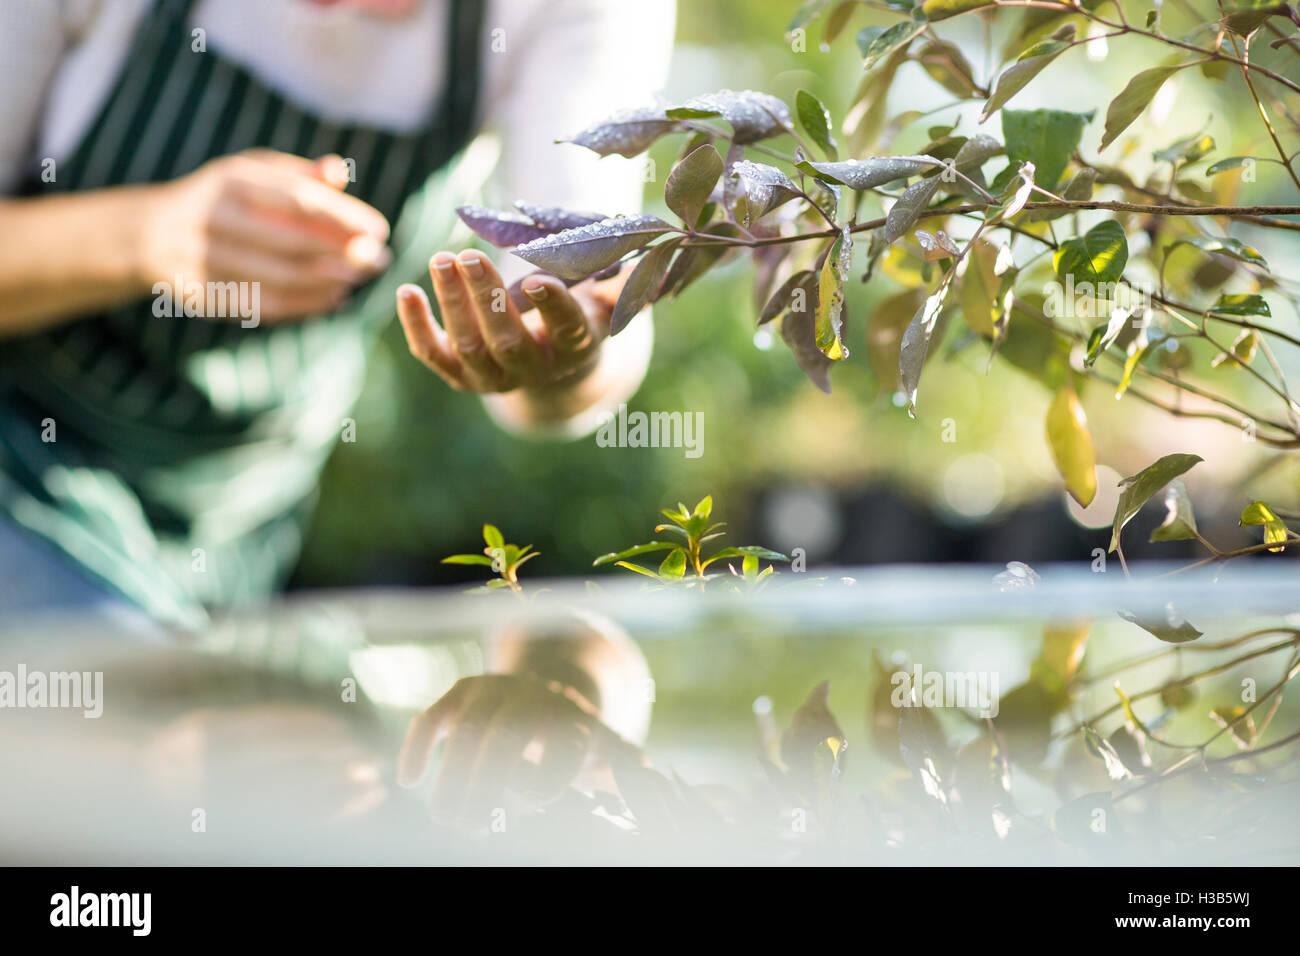 Midsection of female gardener examining plants - Stock Image